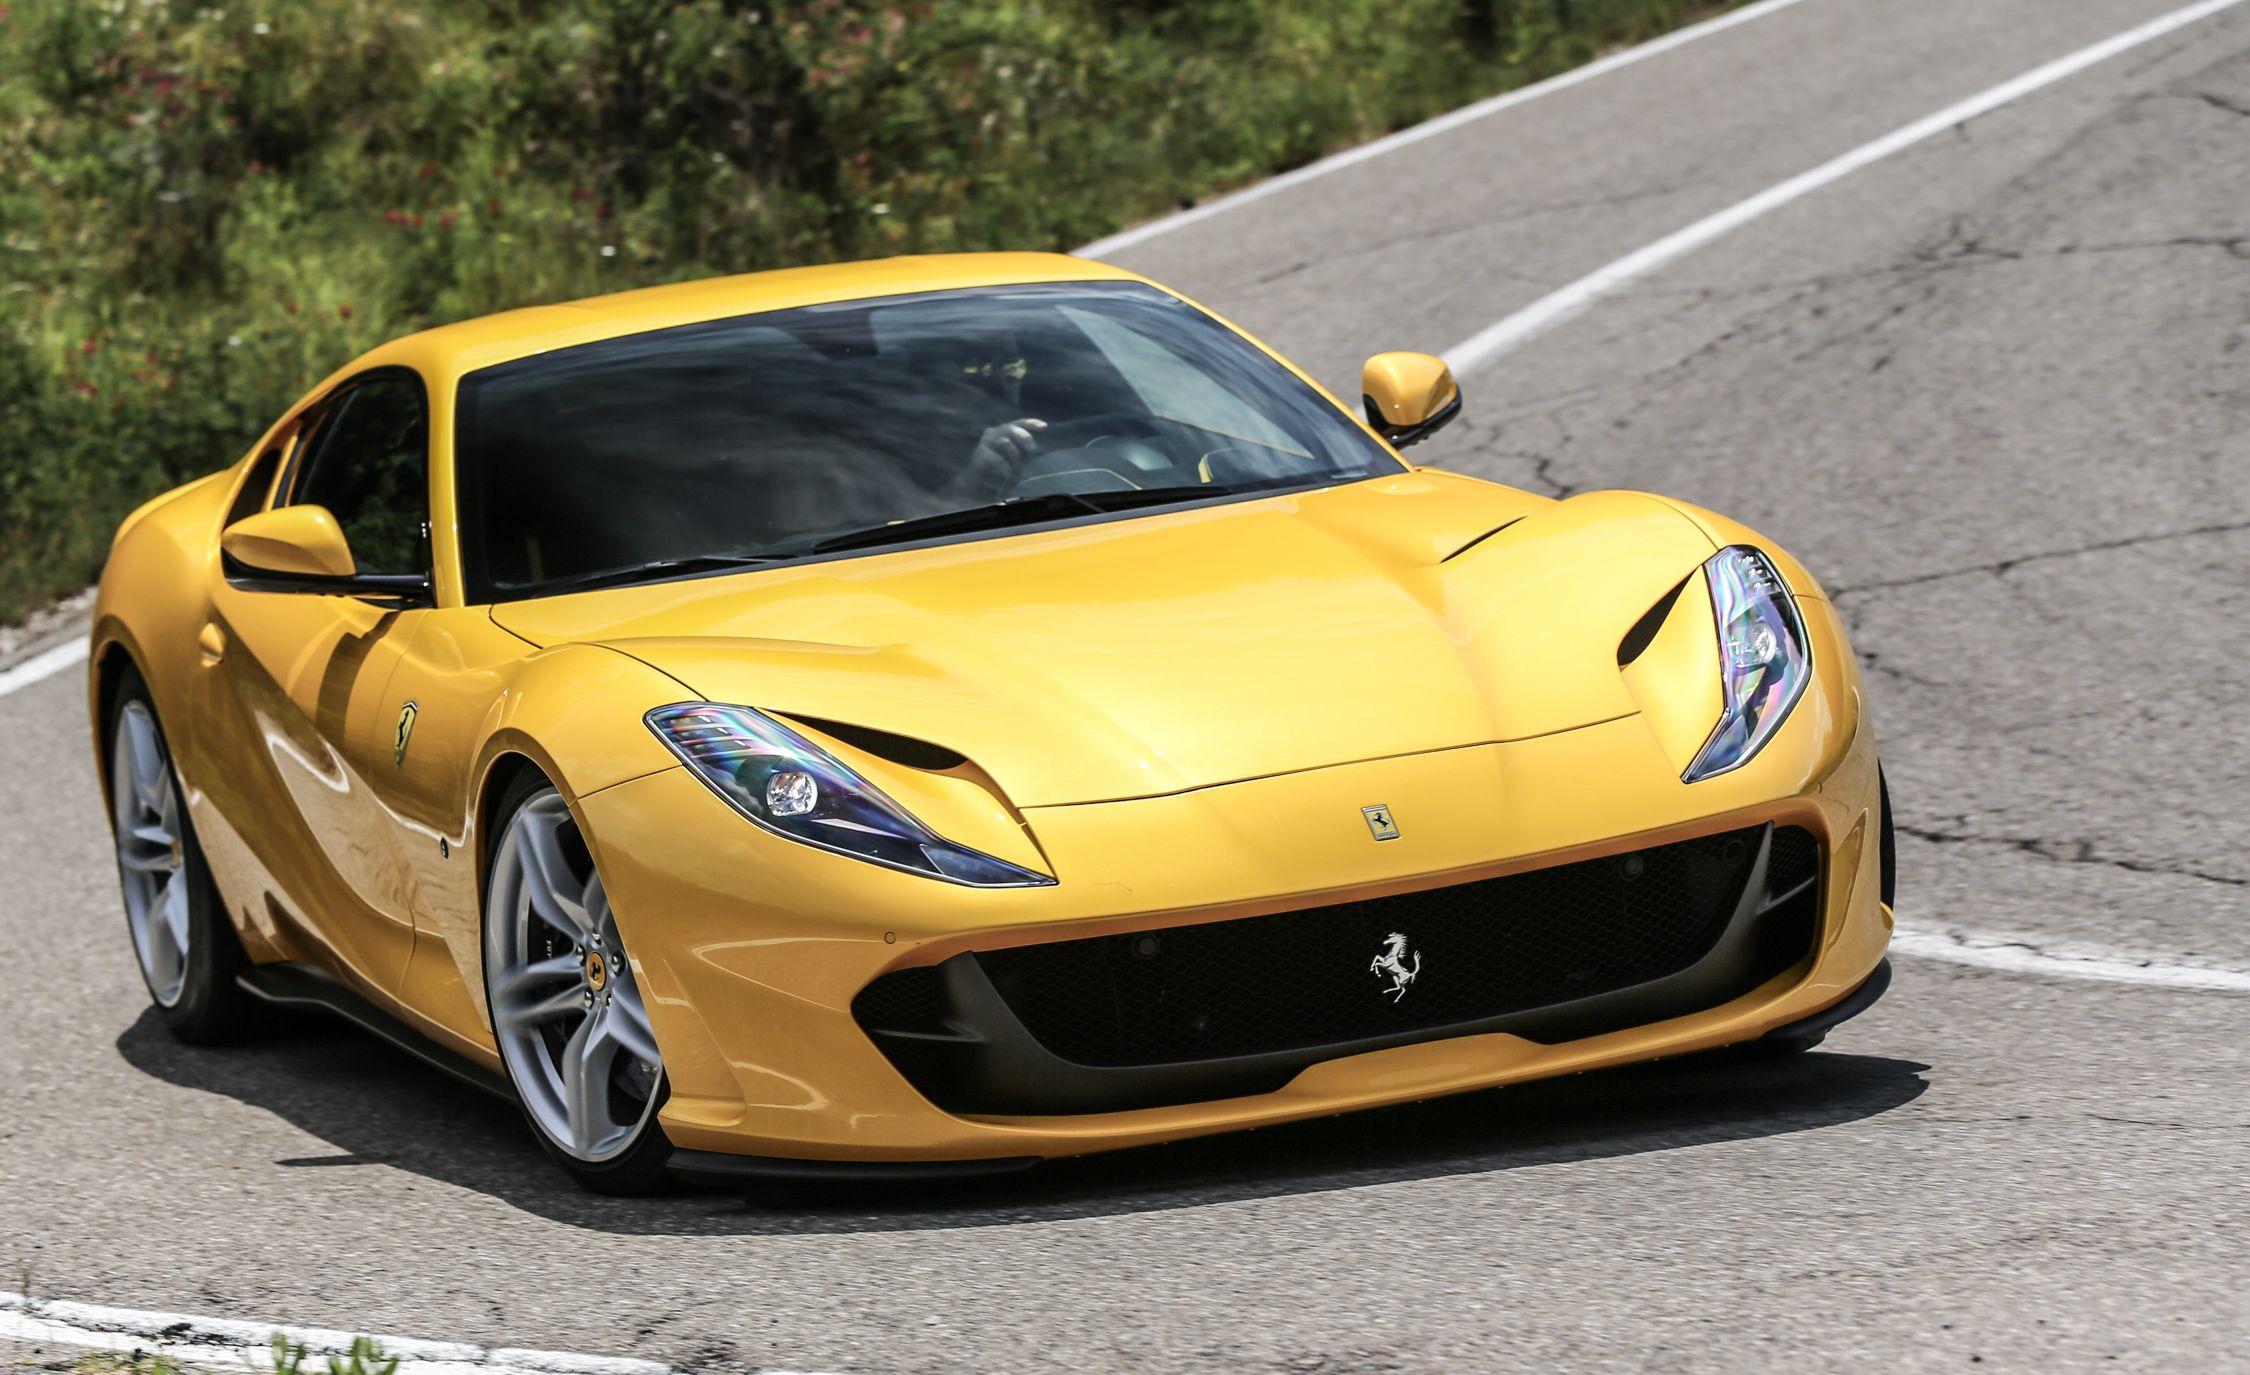 Ferrari 812 Superfast Reviews | Ferrari 812 Superfast Price, Photos, And  Specs | Car And Driver